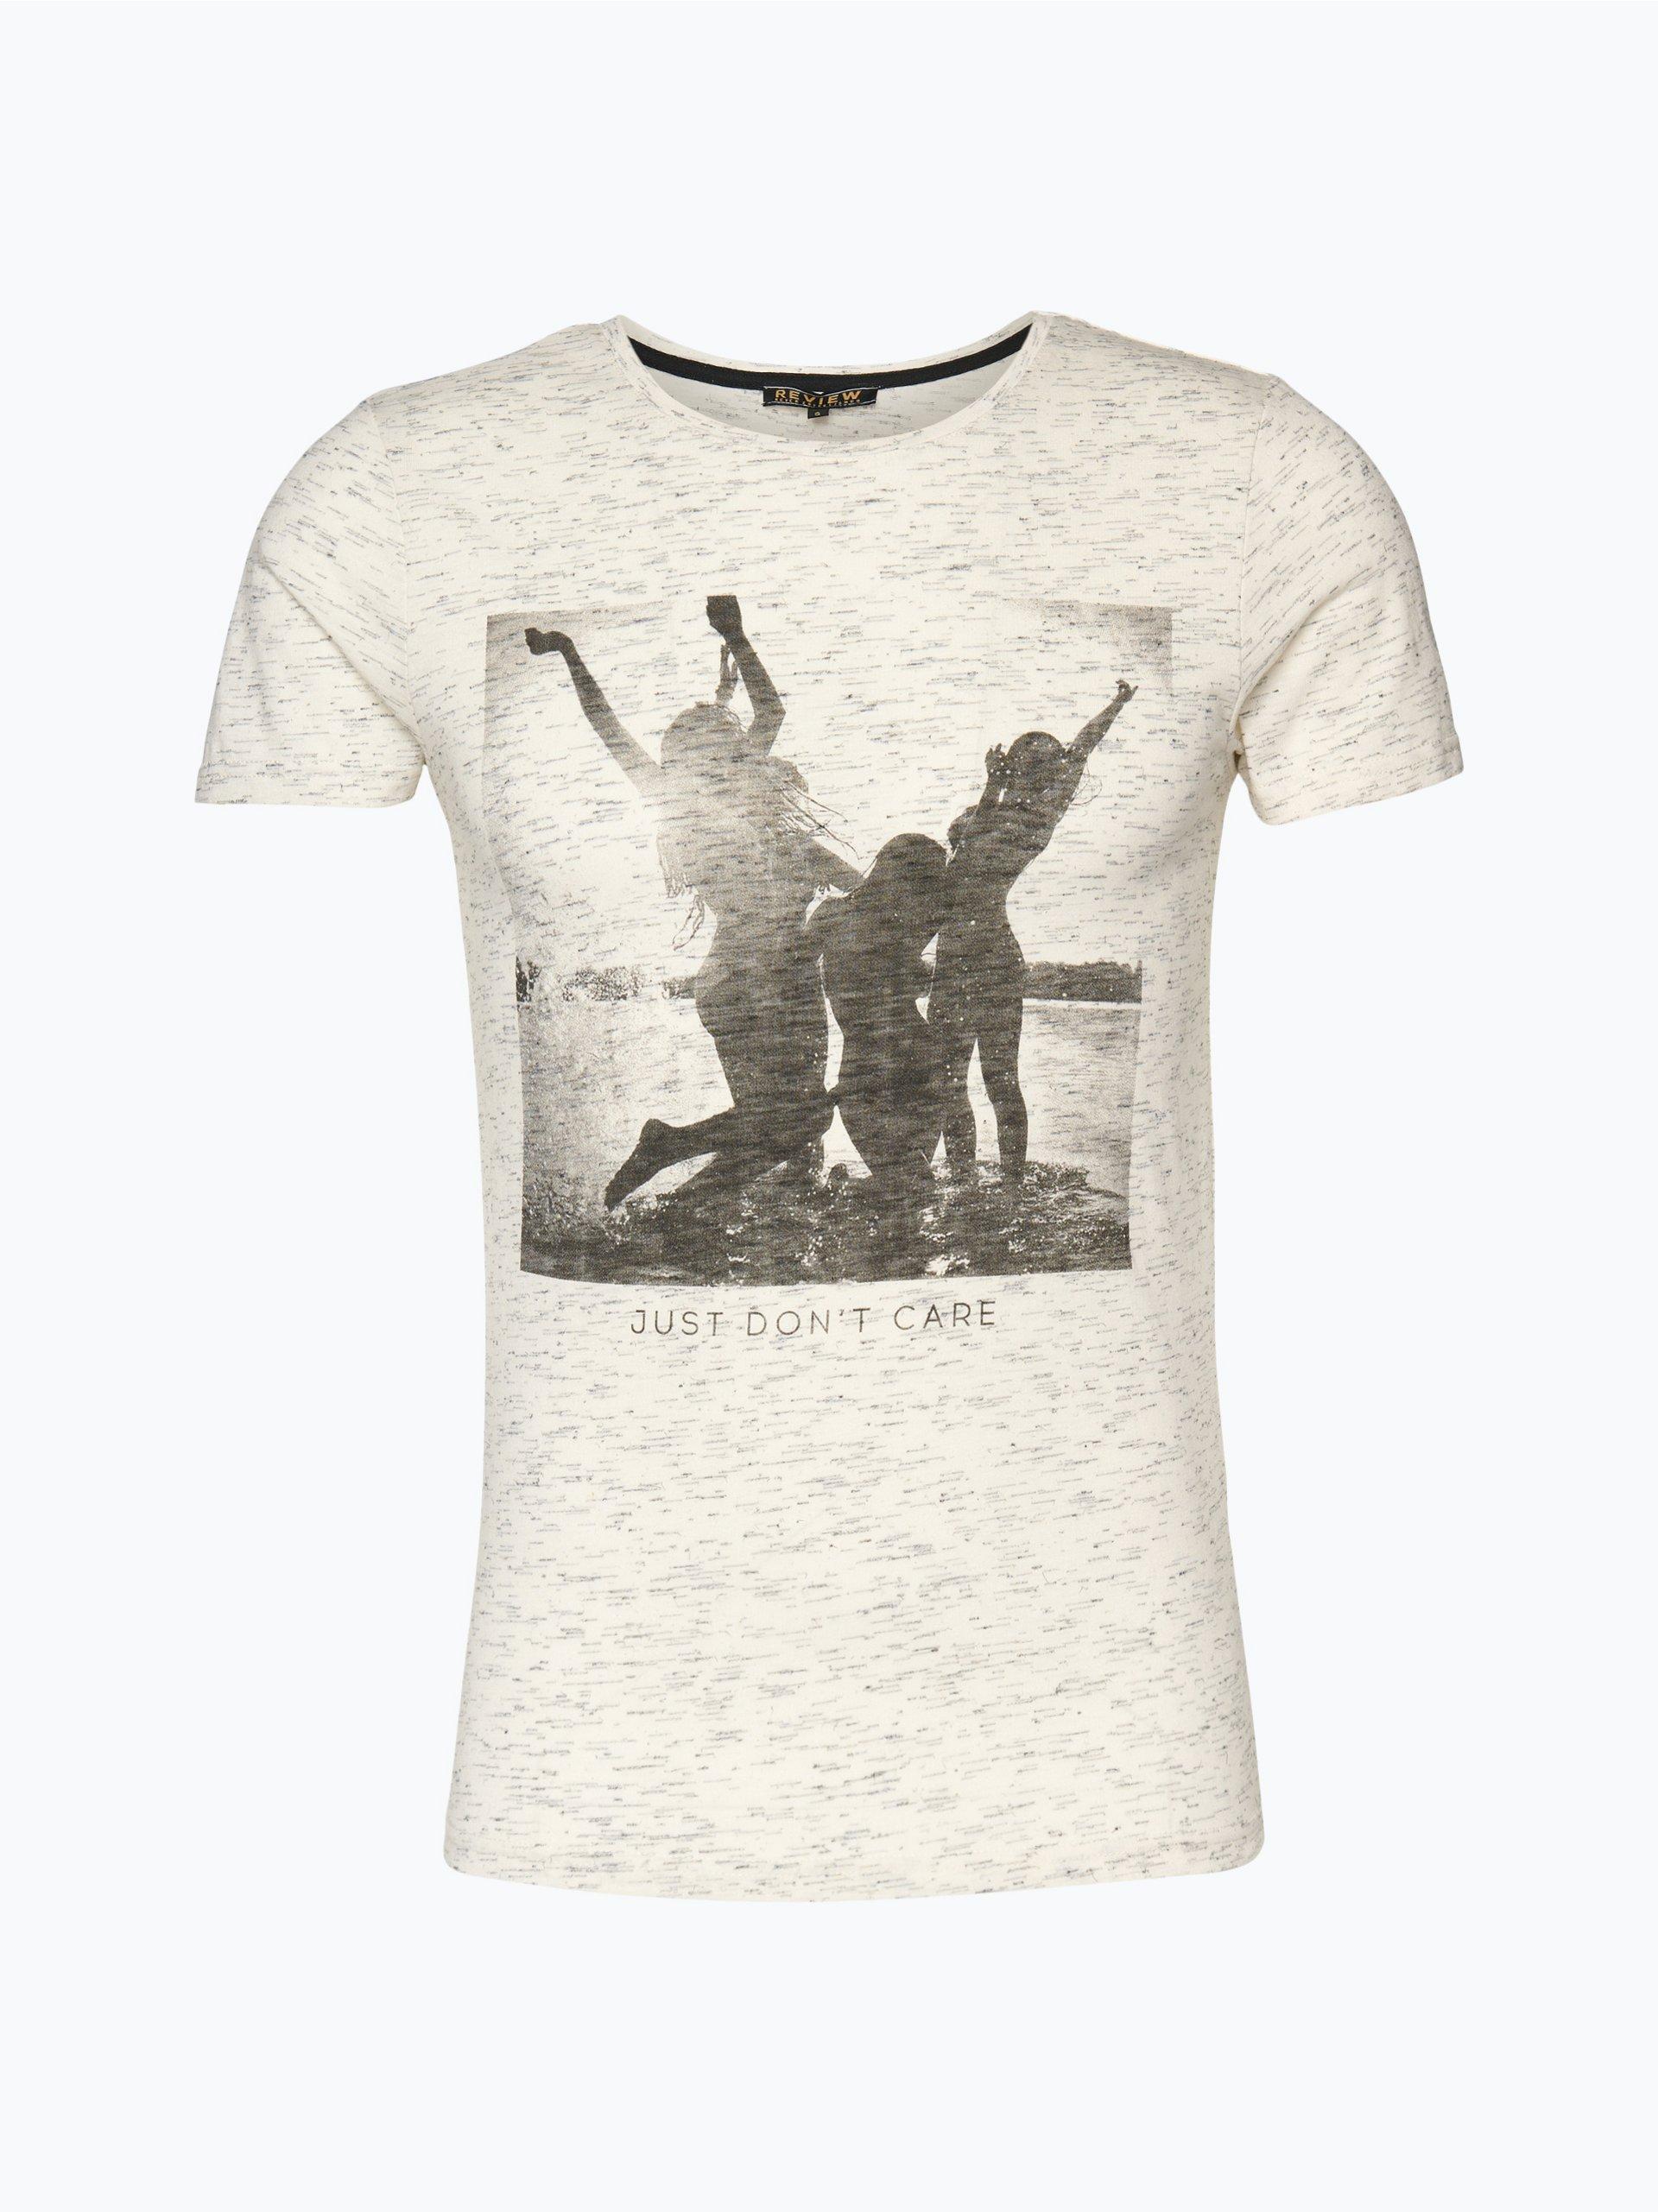 review herren t shirt wei gemustert online kaufen peek und cloppenburg de. Black Bedroom Furniture Sets. Home Design Ideas